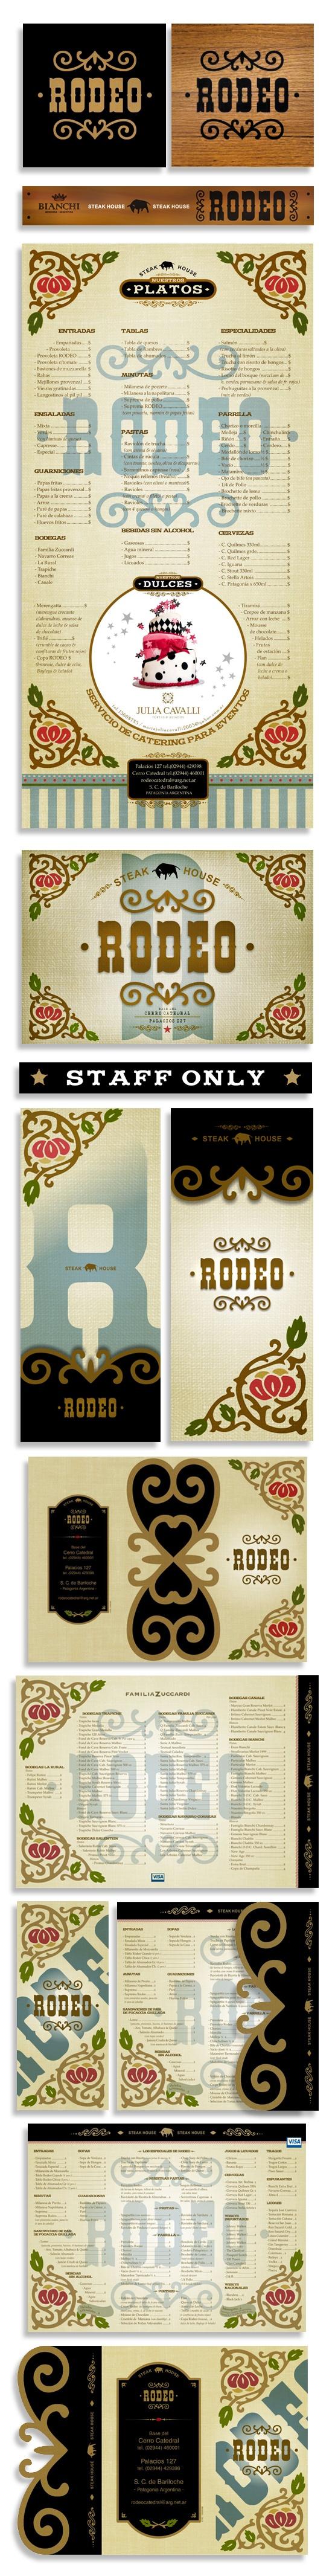 IORC - Logotipo / Grafica aplicada, Rodeo '08